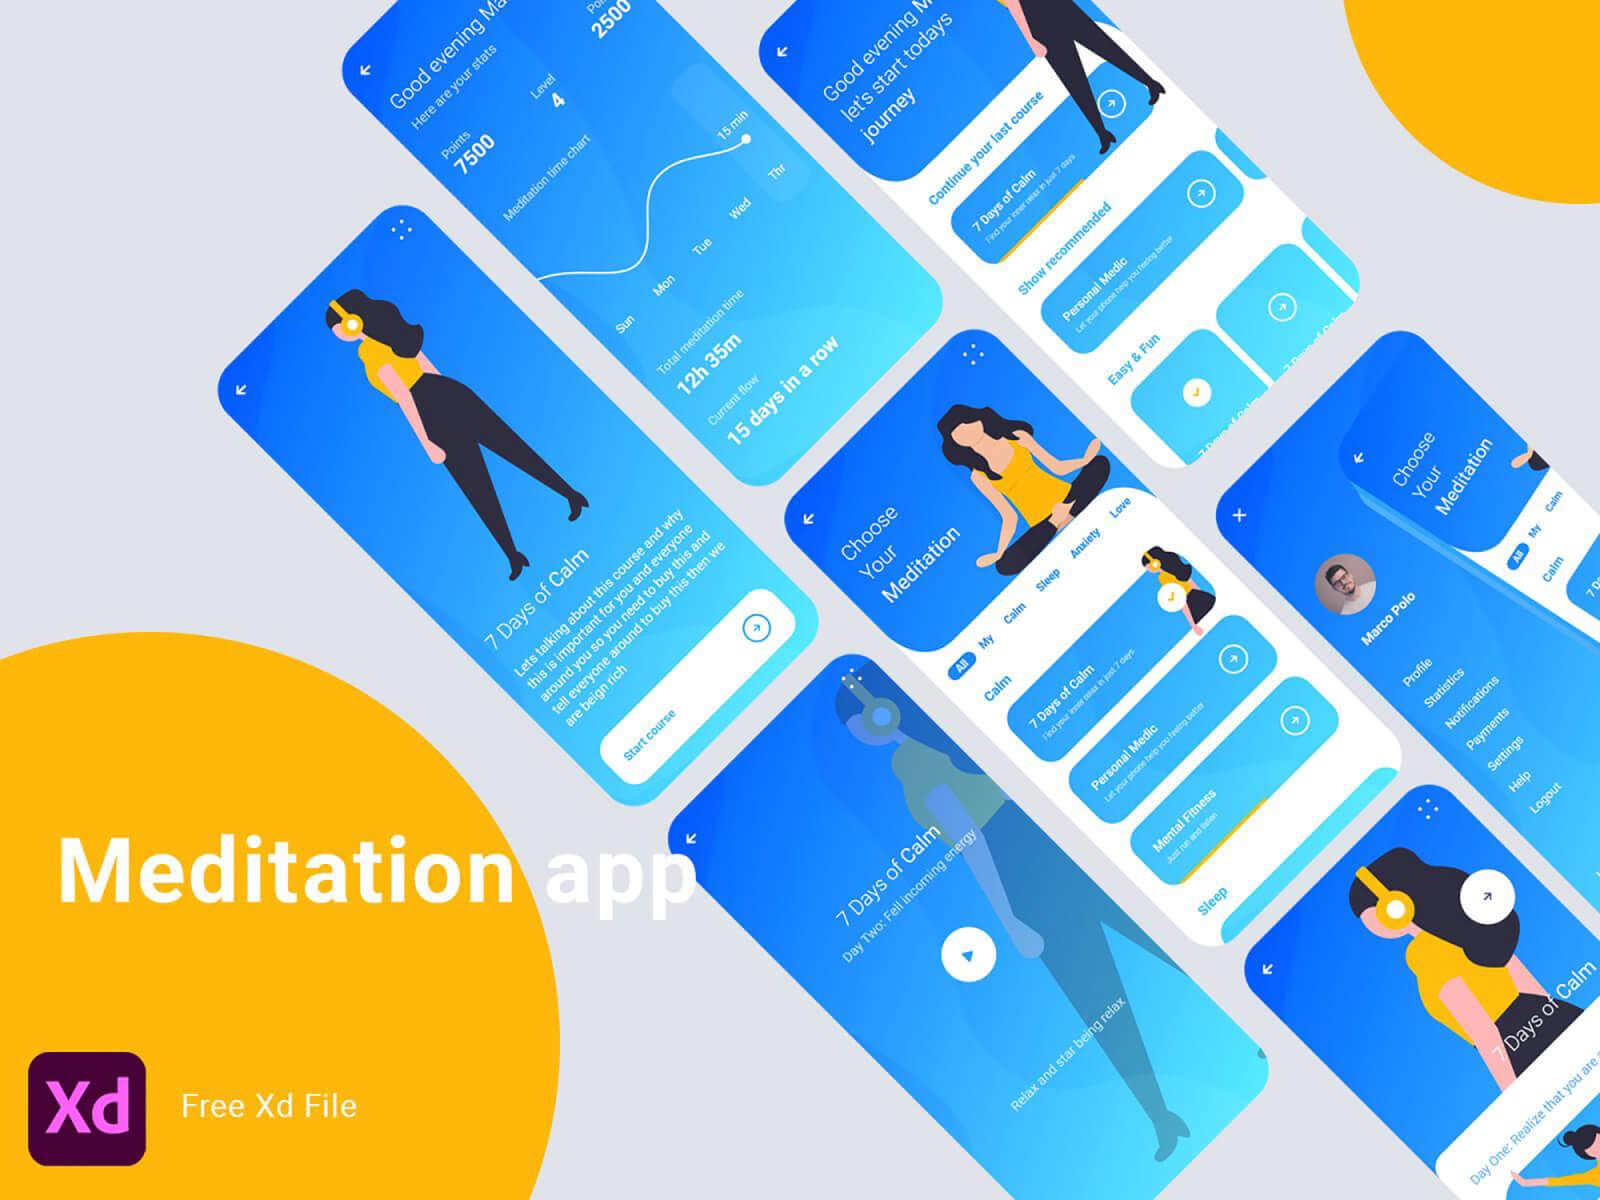 Meditation App Concept cover image